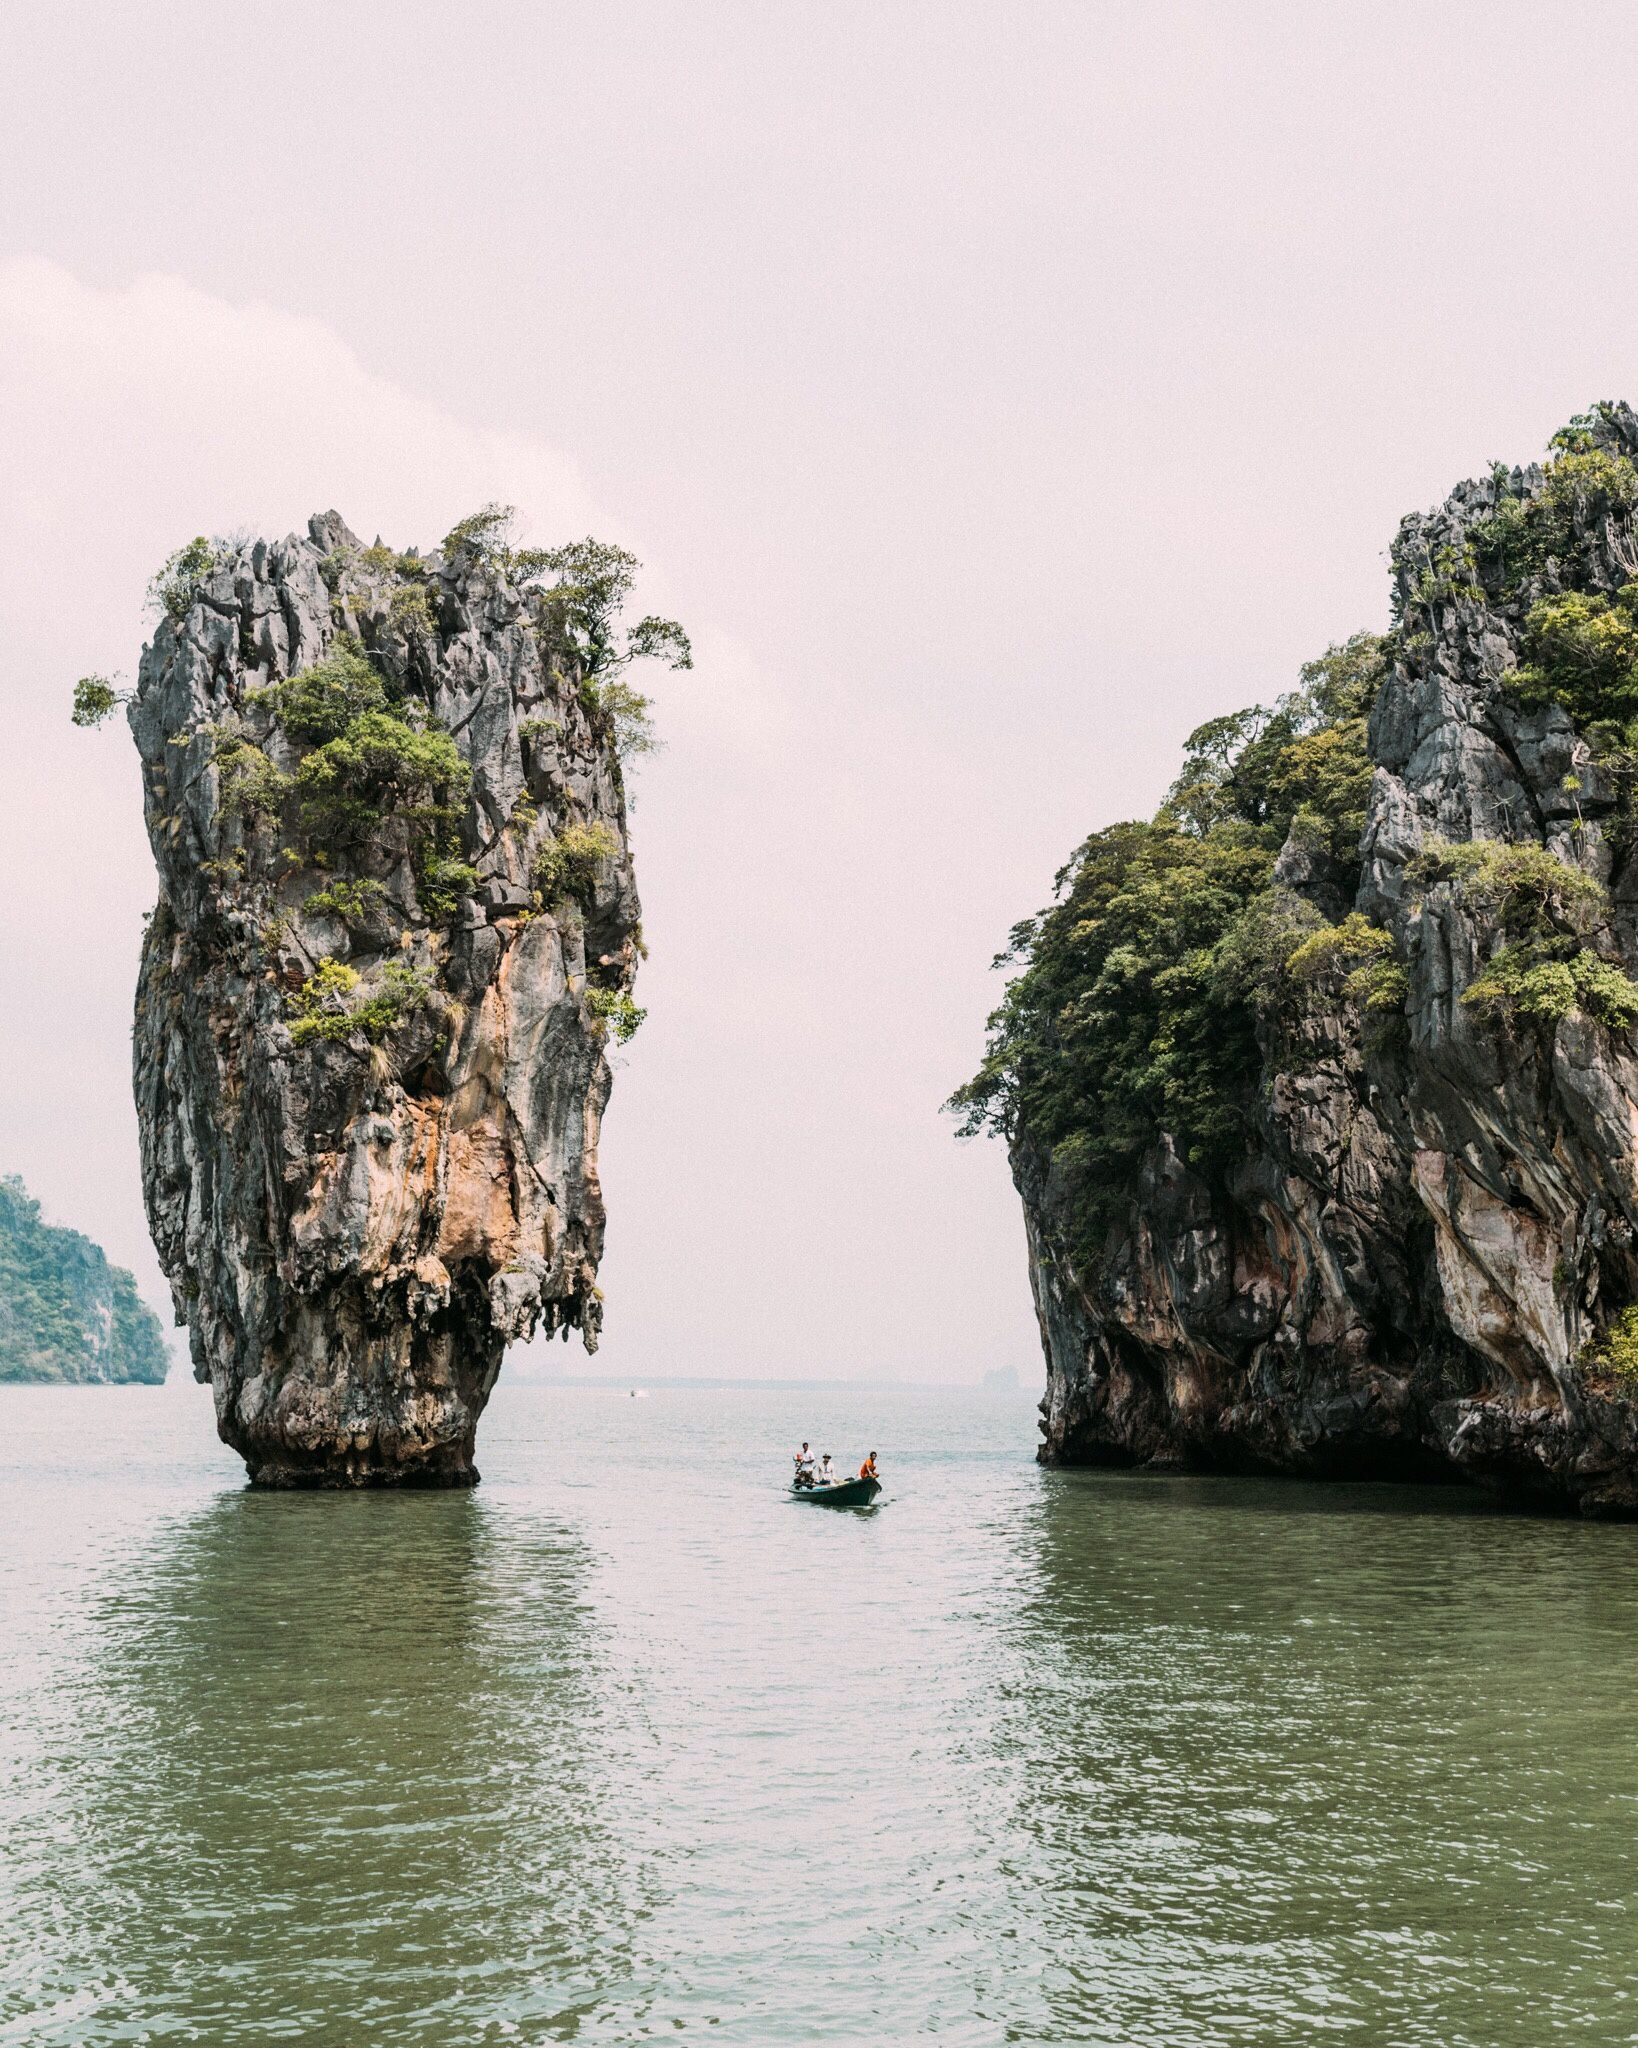 James Bond island, Phuket, Thailand by Alina Tsvor on 500px